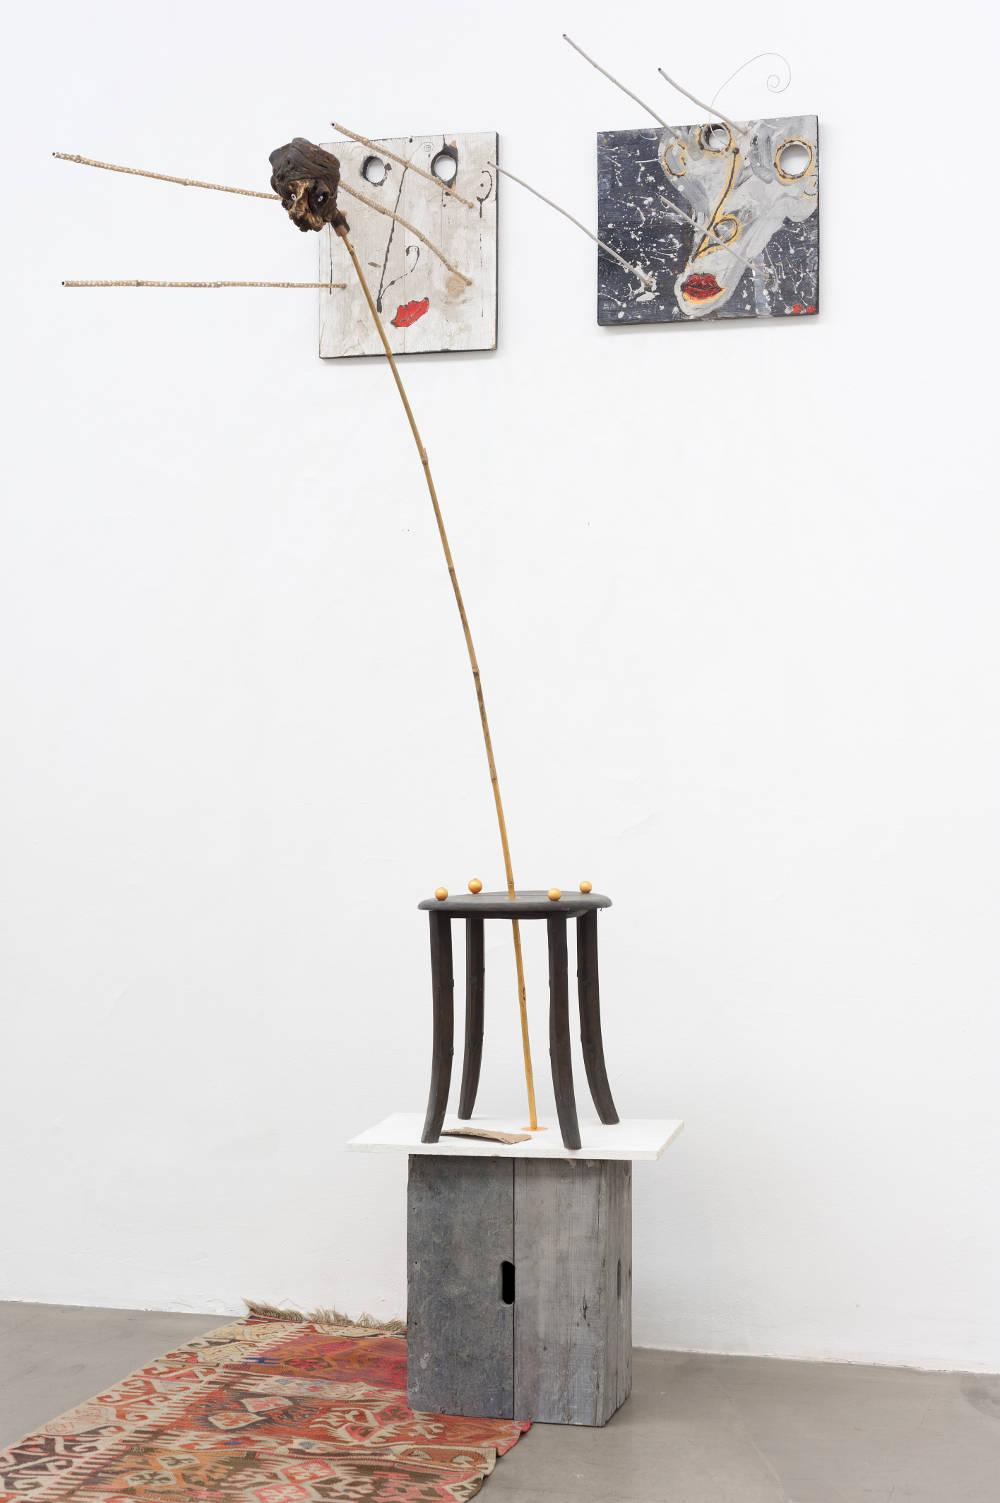 Heinz-Frank Kunsthalle Wien